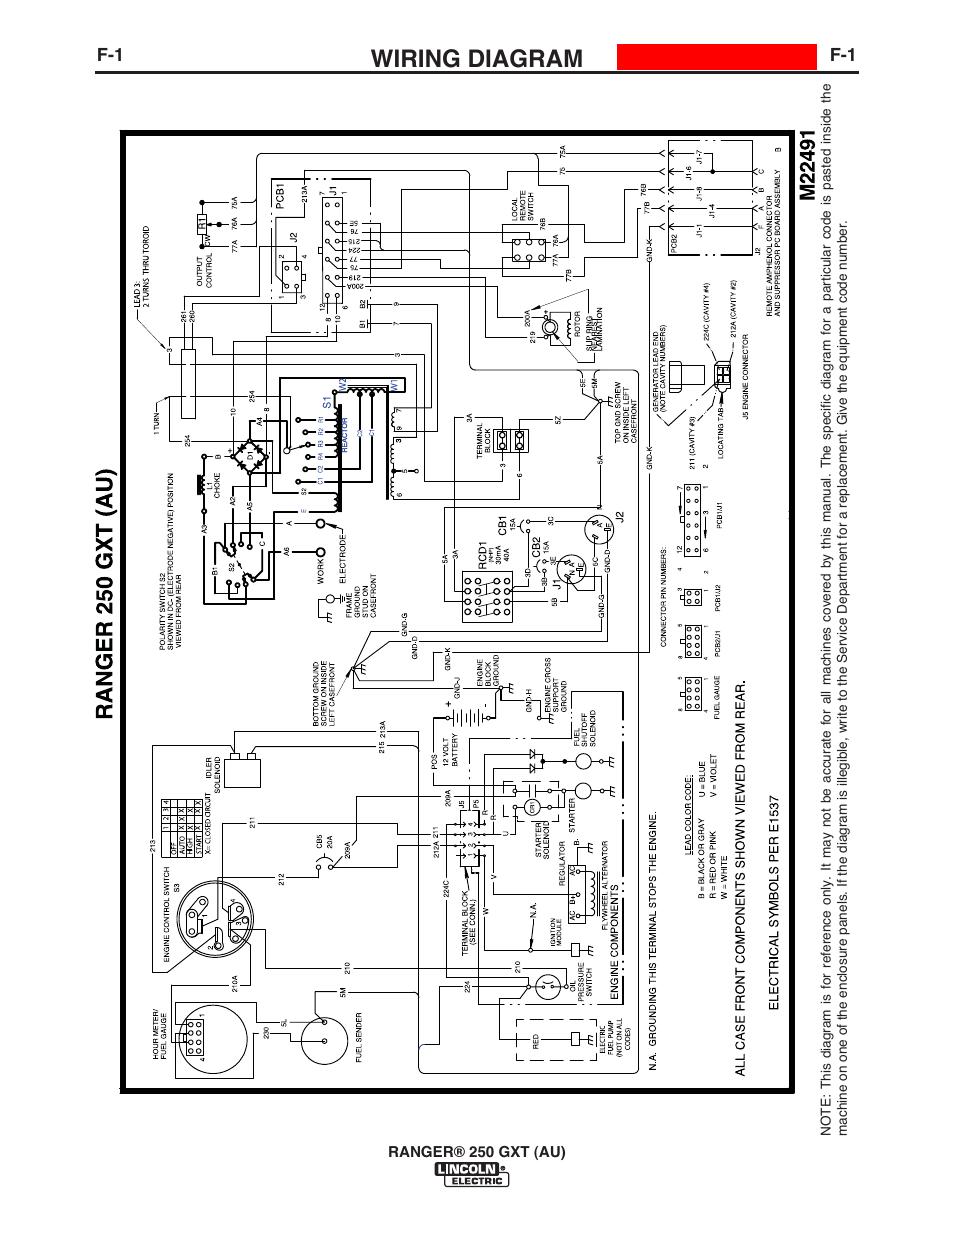 lincoln electric welder parts diagram john deere 3020 gas wiring ranger uwy vipie de rh skriptex